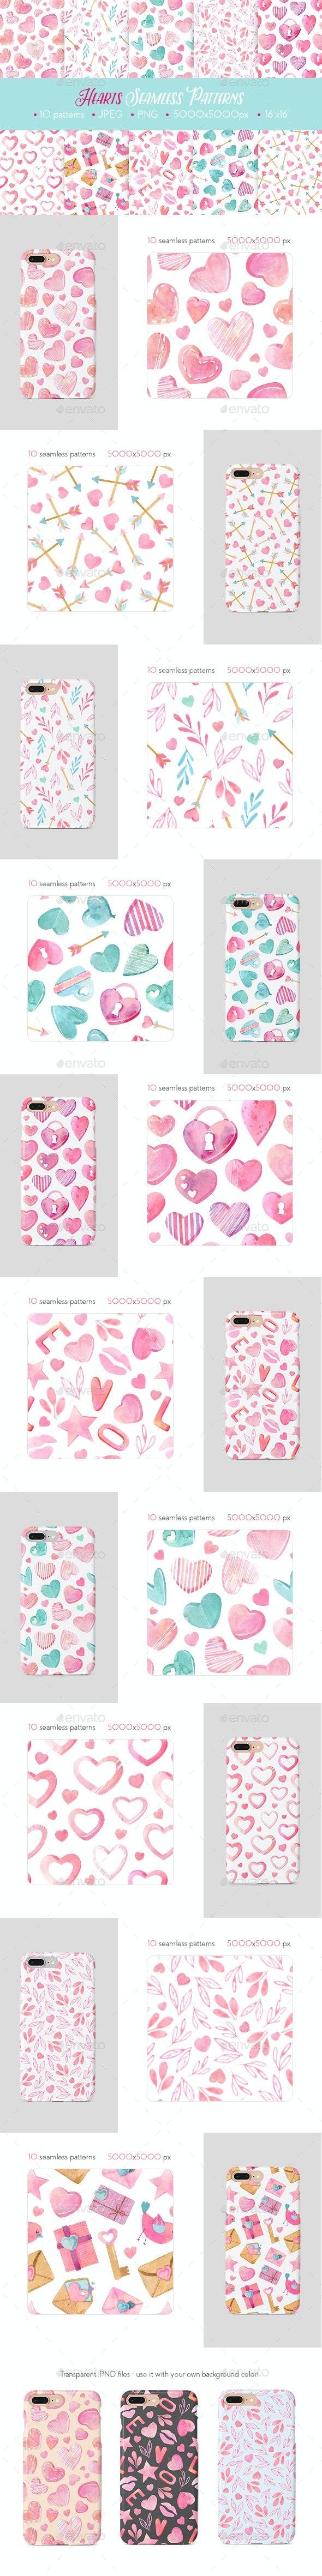 Watercolor Hearts Seamless Patterns - Patterns Decorative